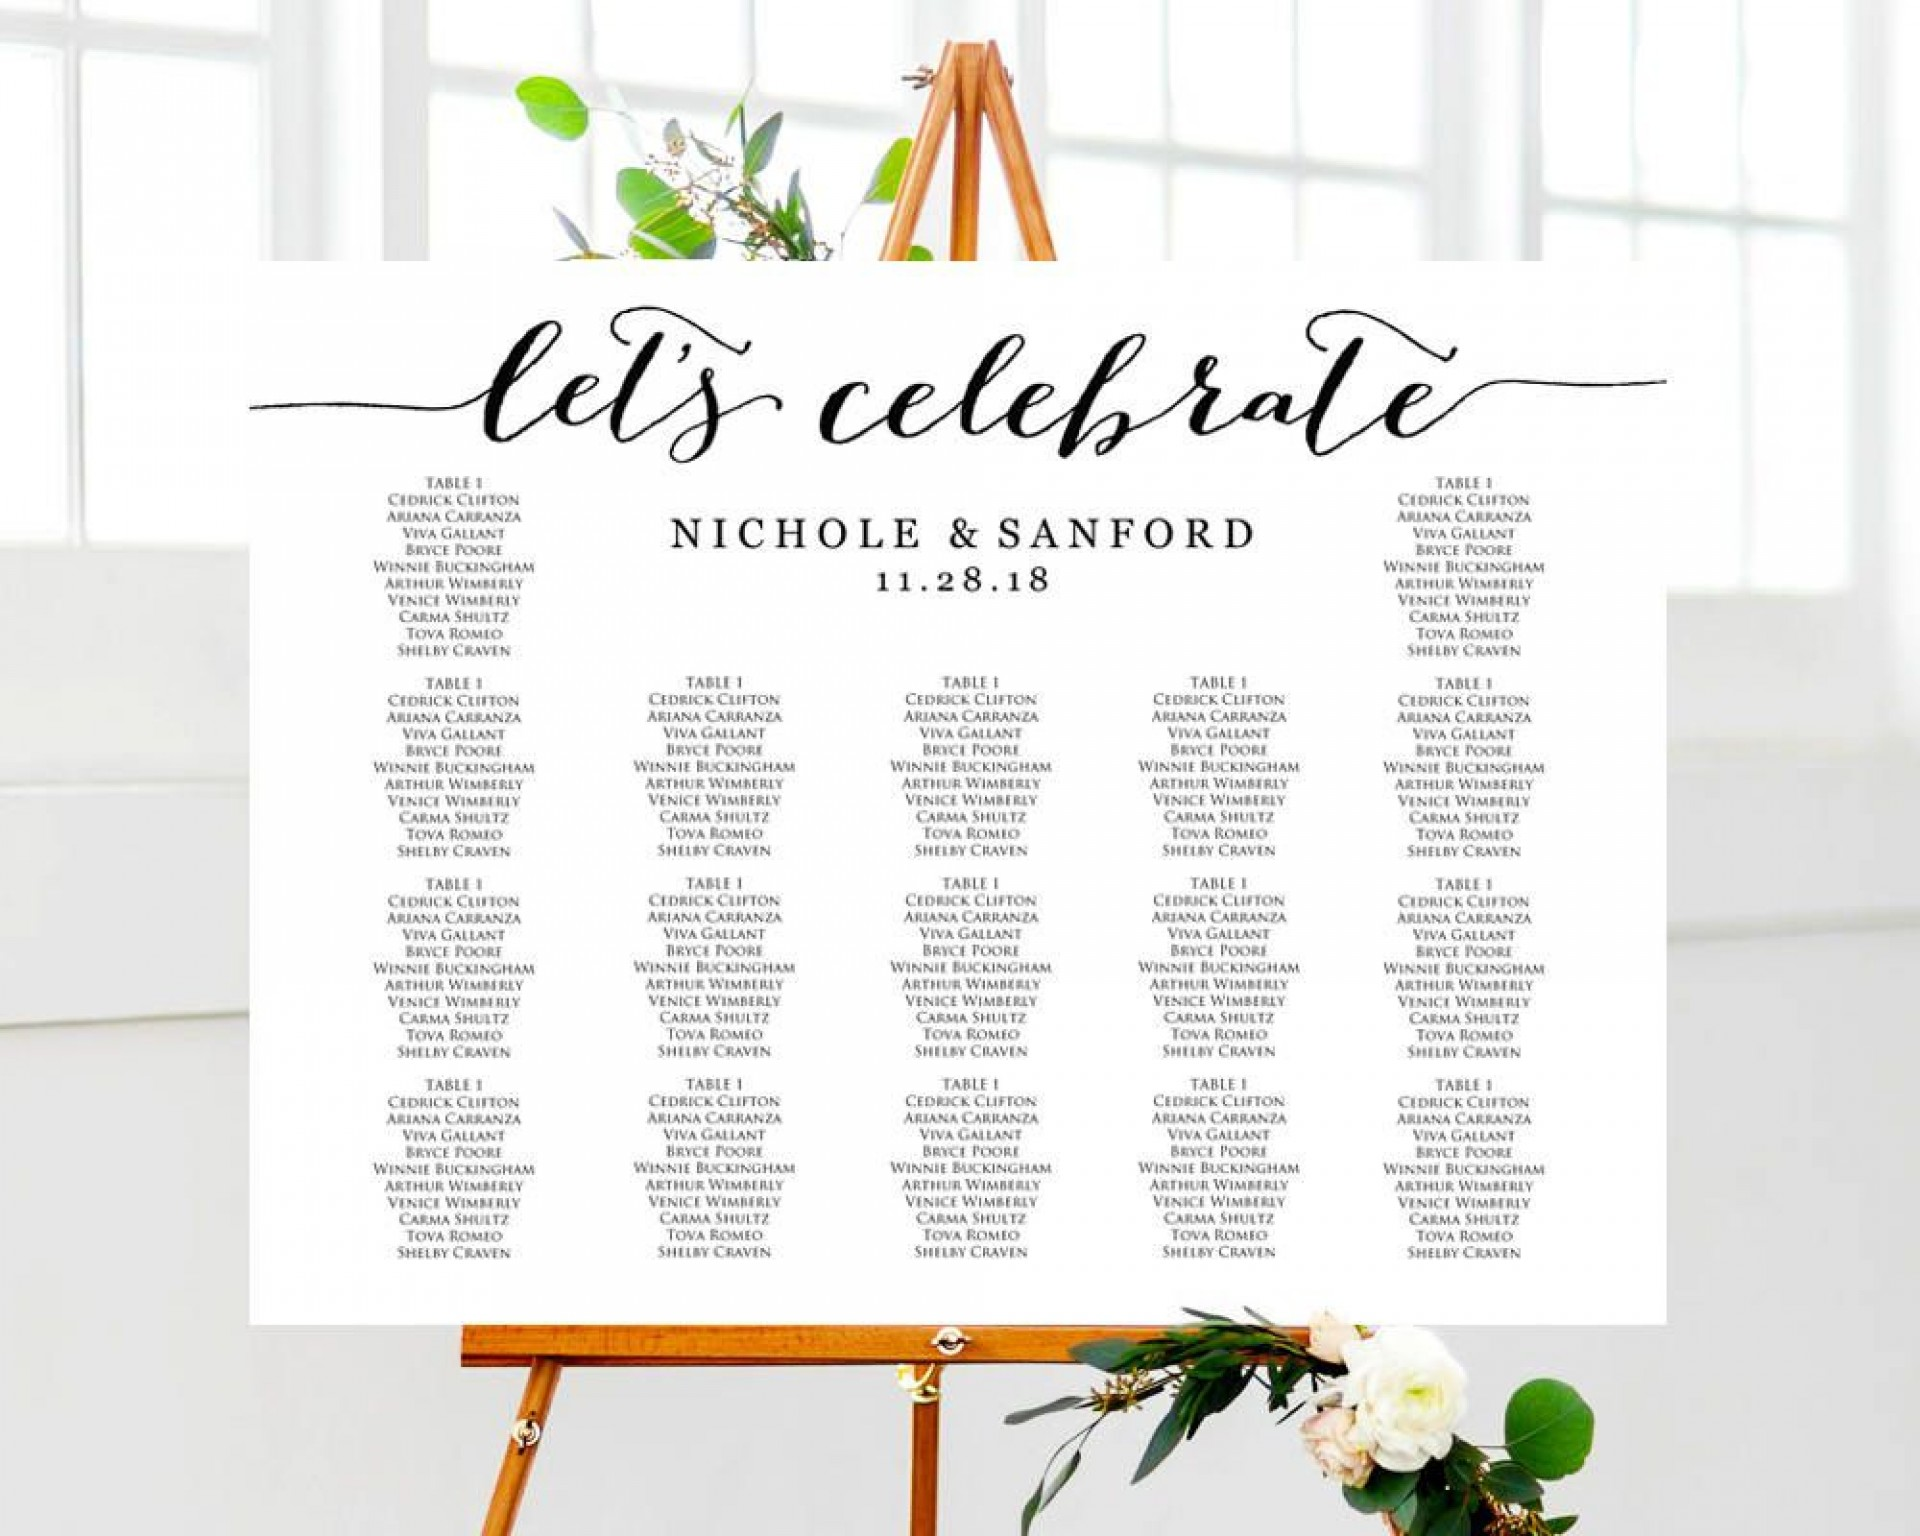 008 Sensational Wedding Seating Chart Template Highest Clarity  Templates Plan Excel Word Microsoft1920